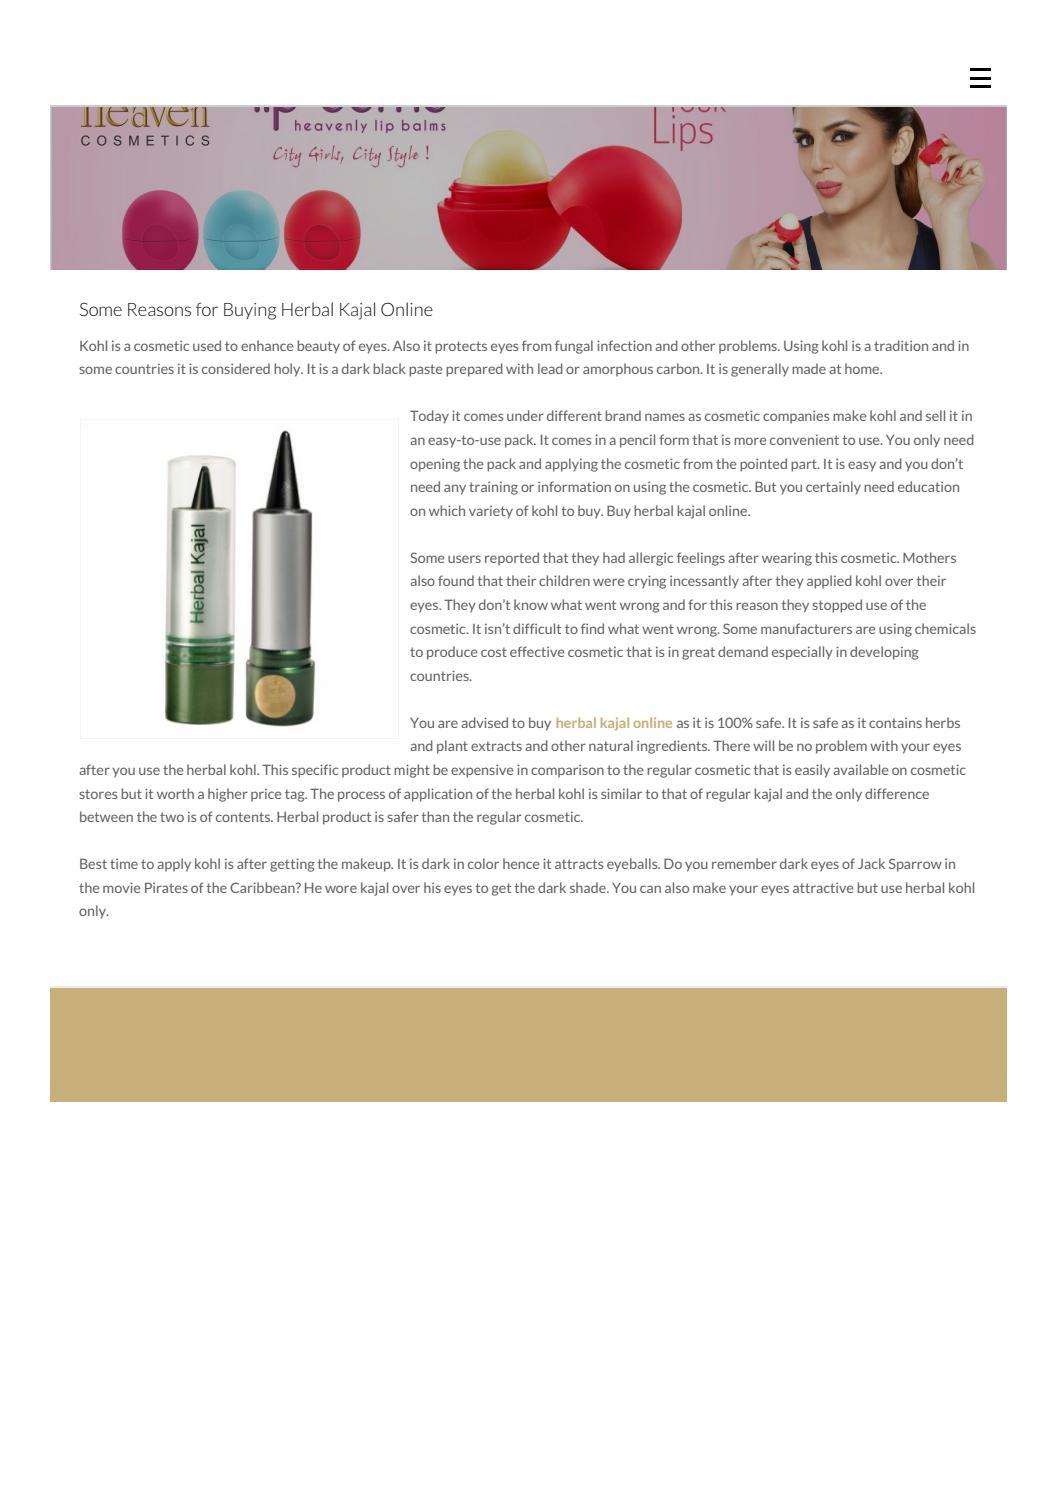 Buyers of herbal product - Buyers Of Herbal Product 12